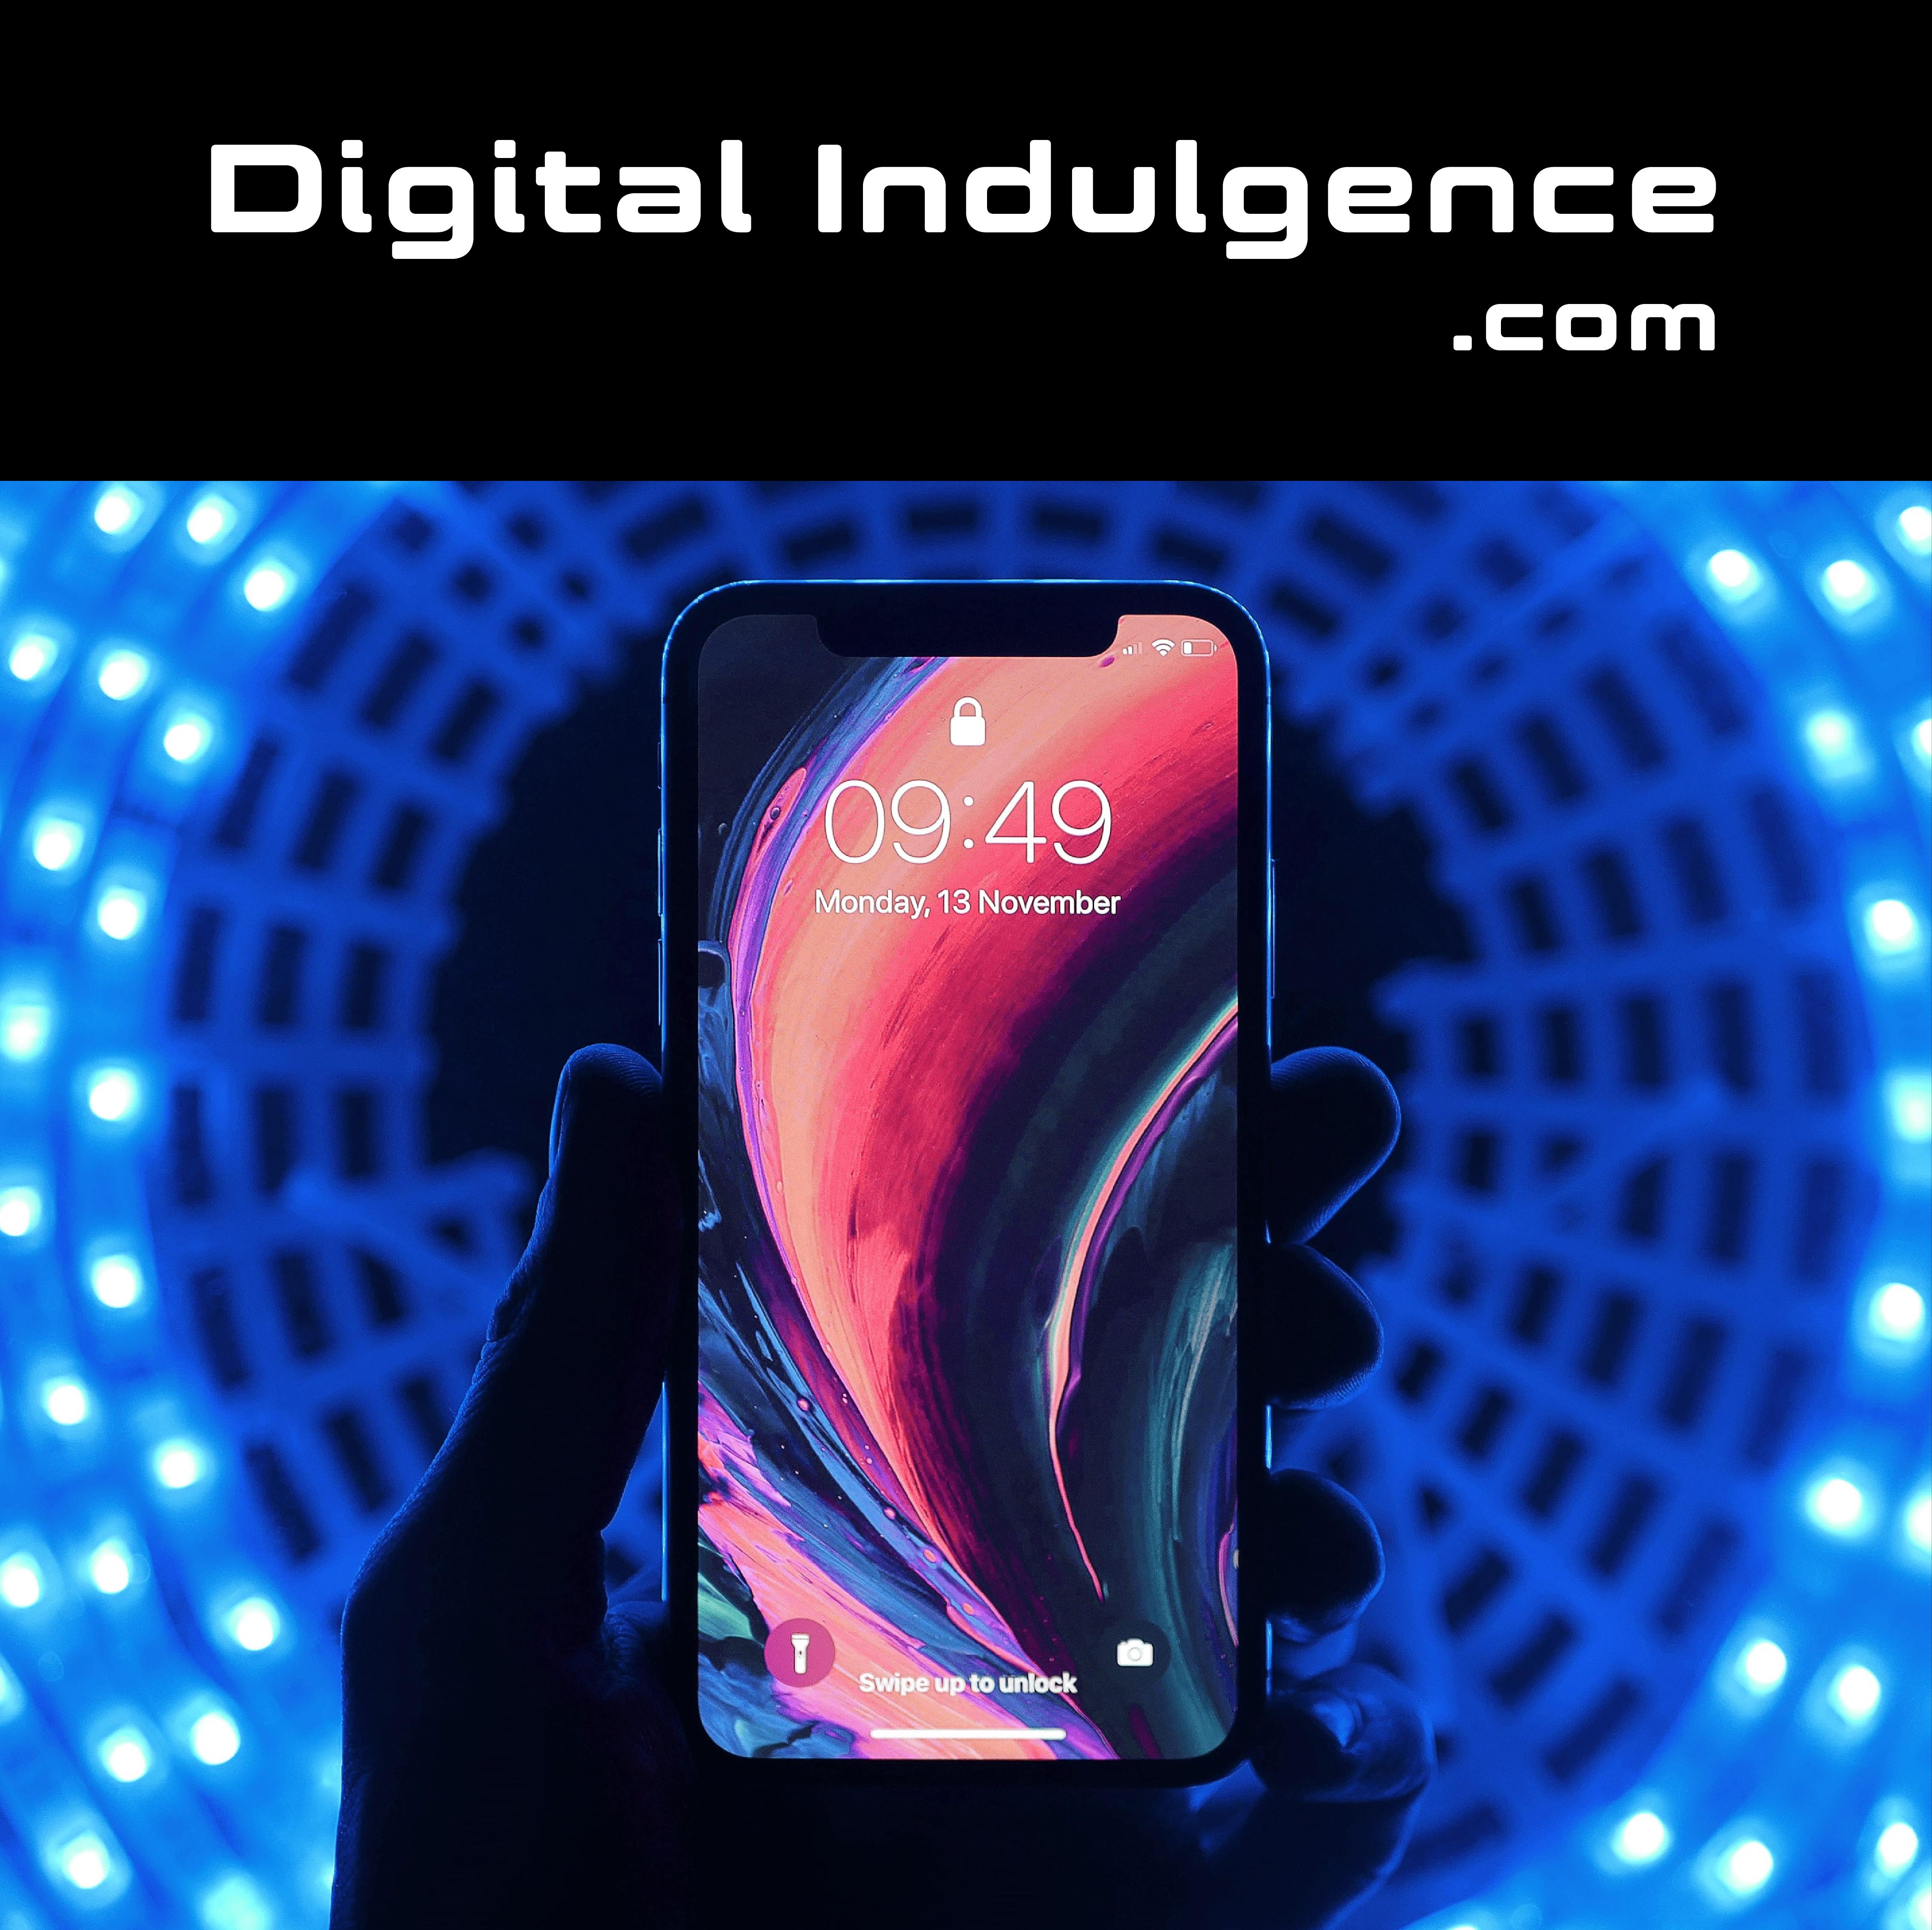 Digital_Indulgence